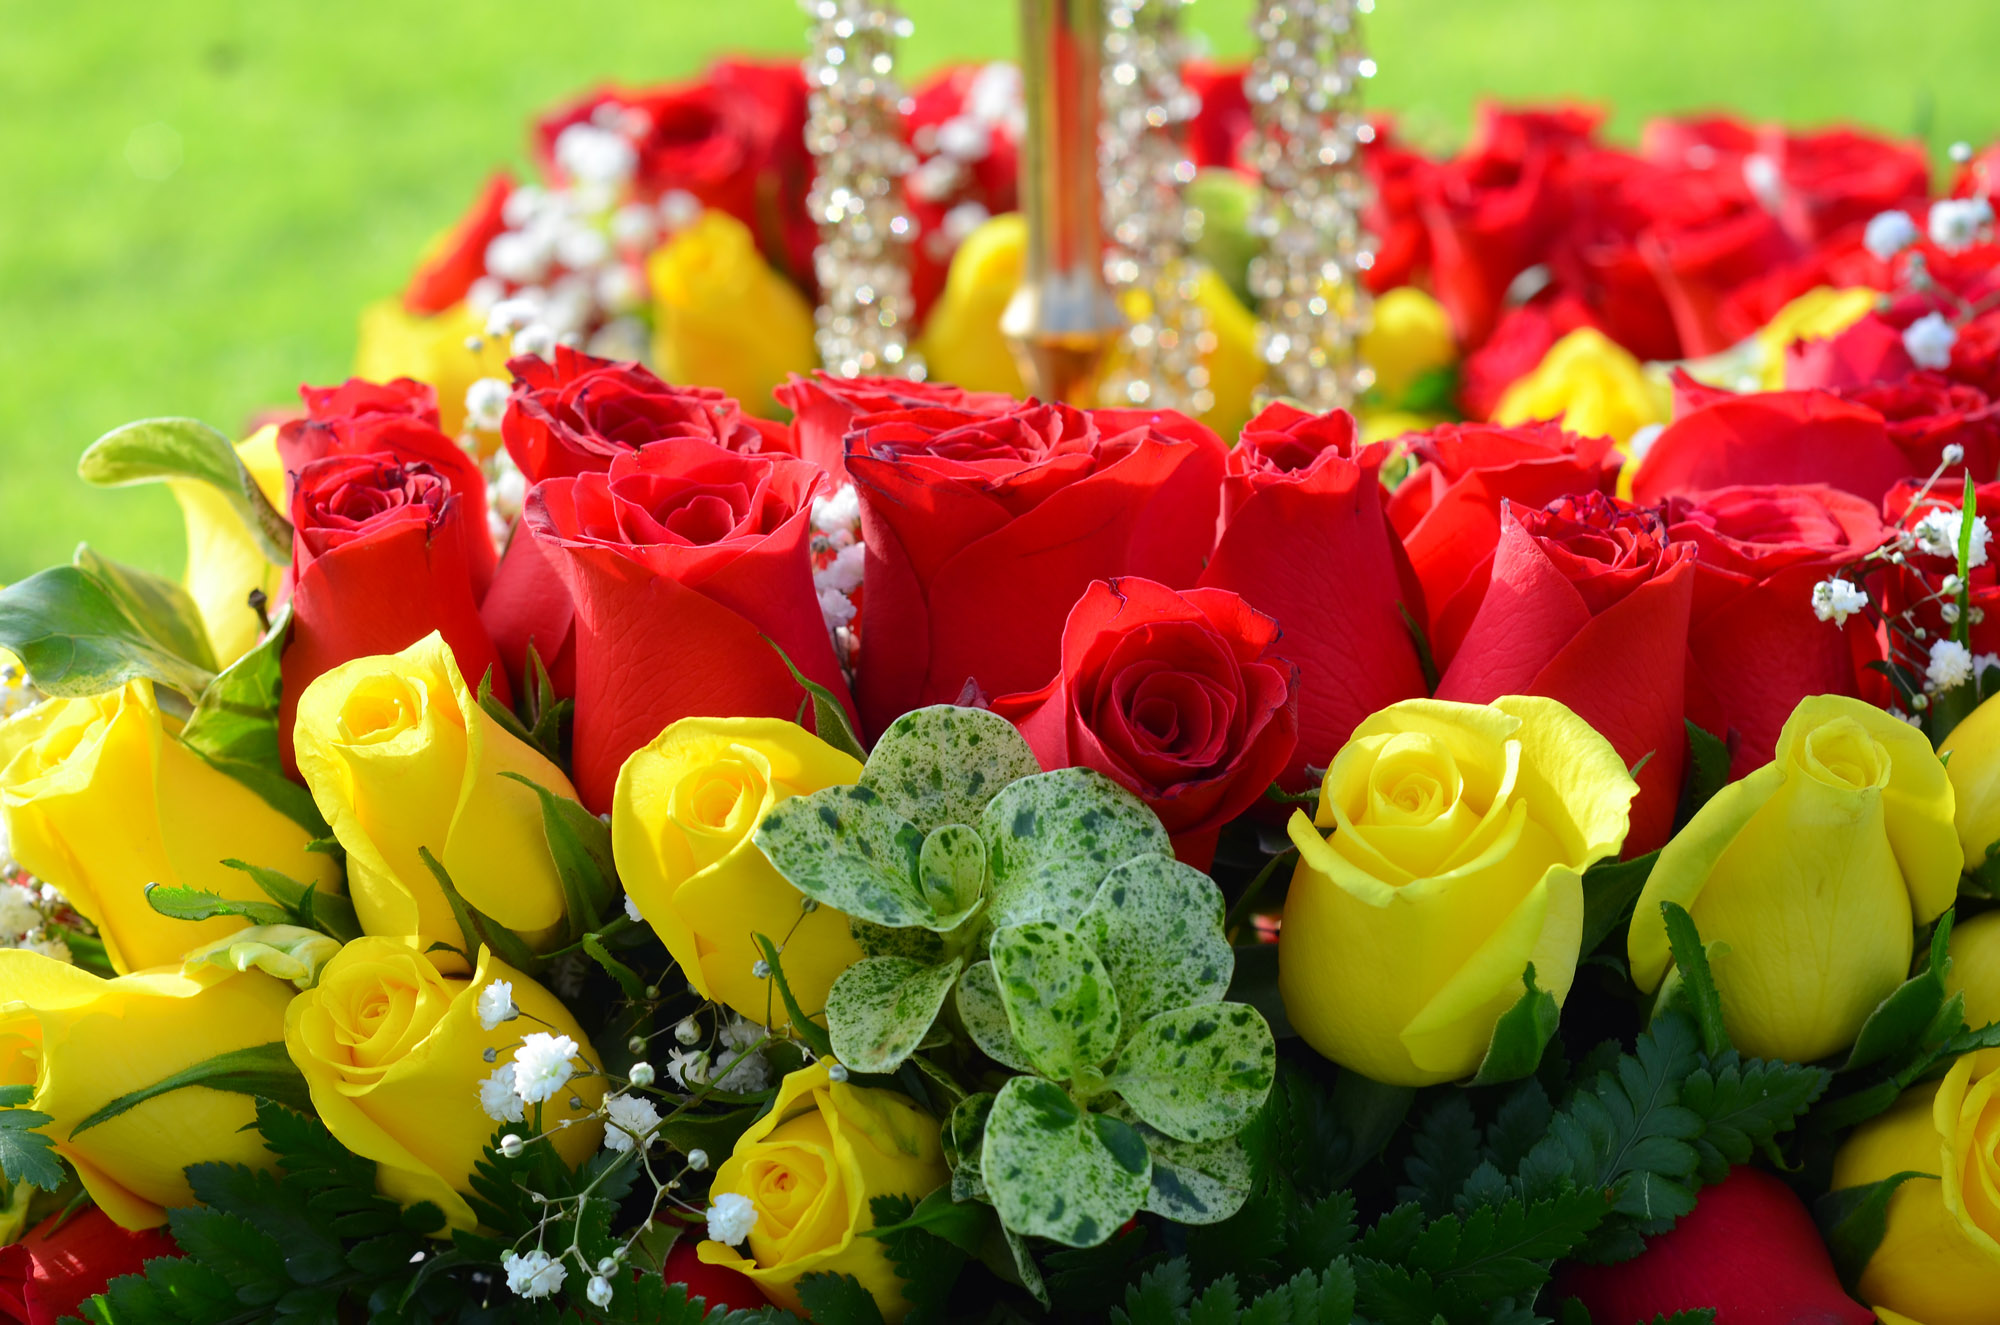 PJ Dave Flora Roses